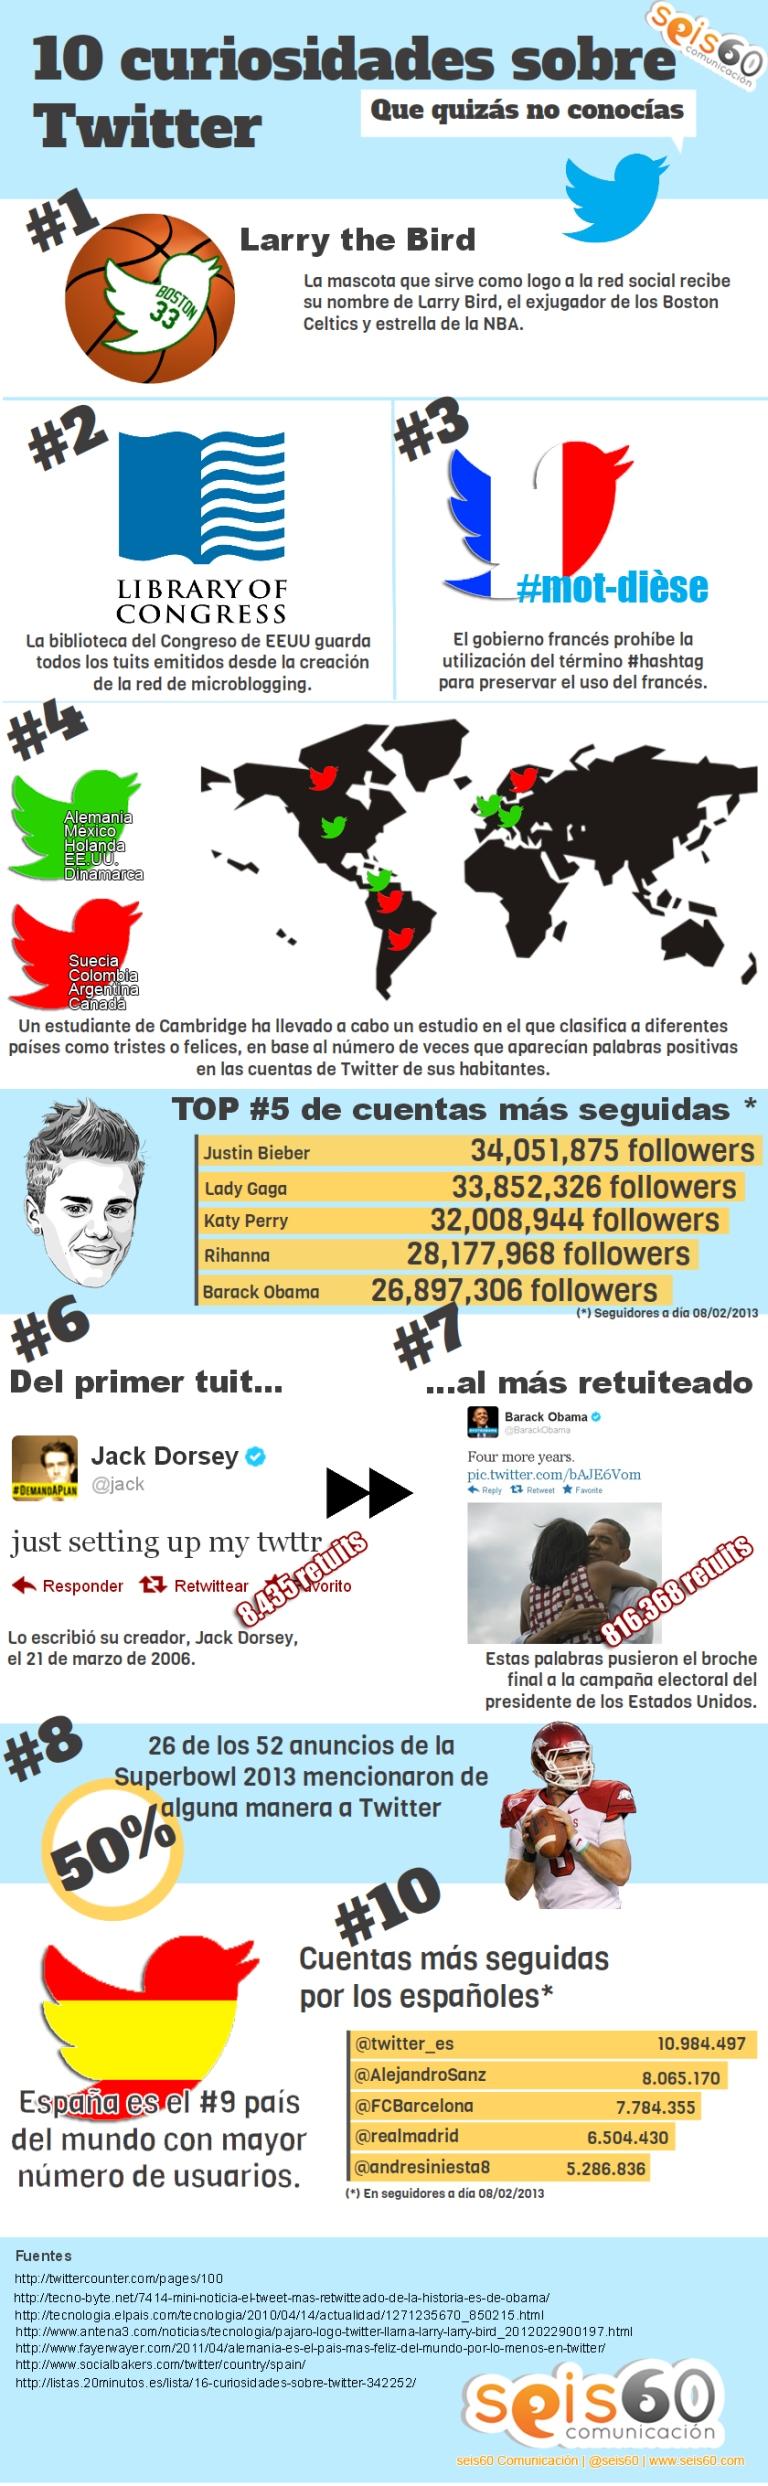 InfografíaTwitter